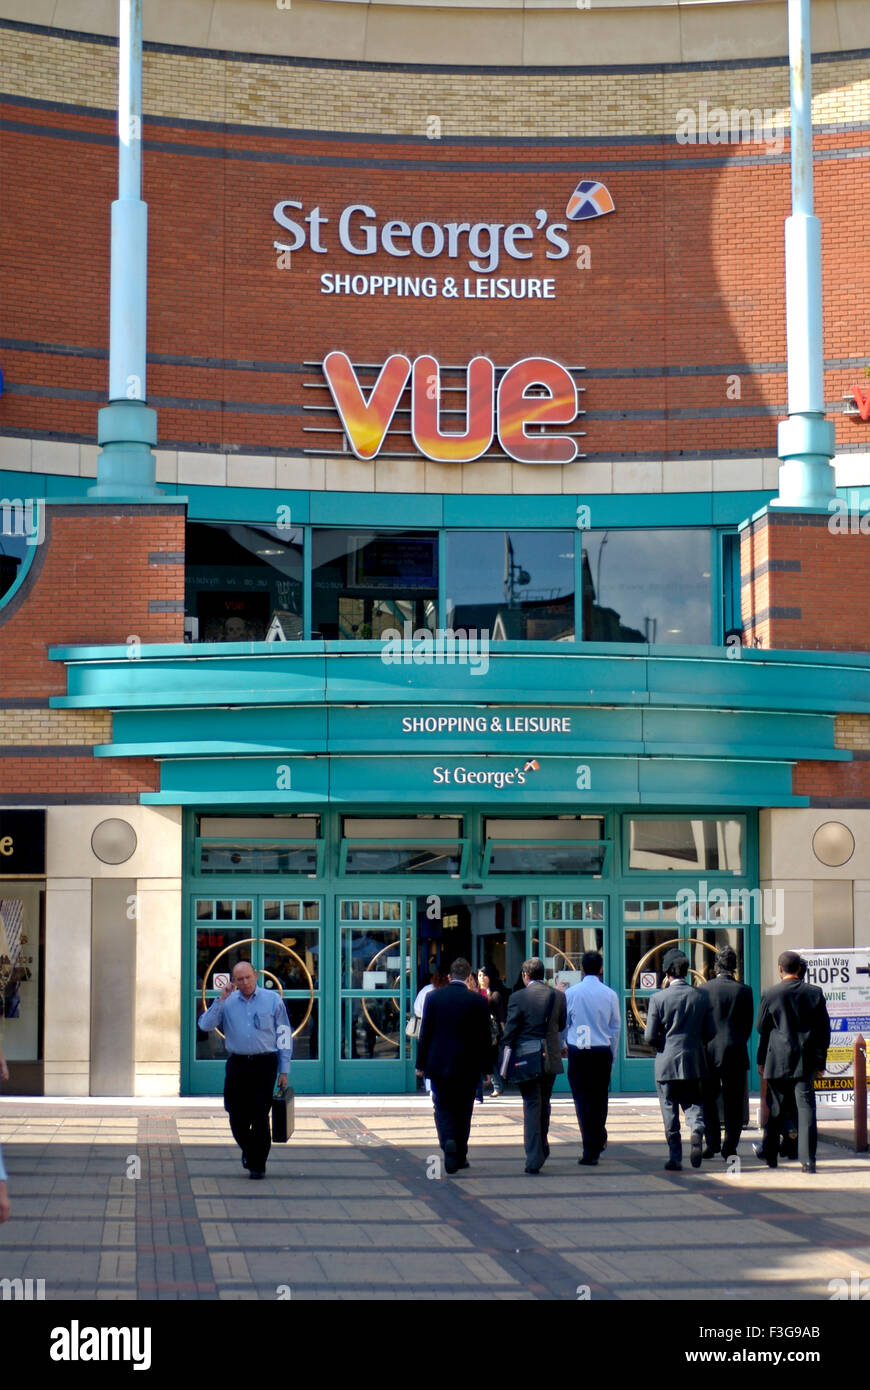 Vue St George's shopping and leisure store ; Harrow ; London ; U.K. United Kingdom England - Stock Image